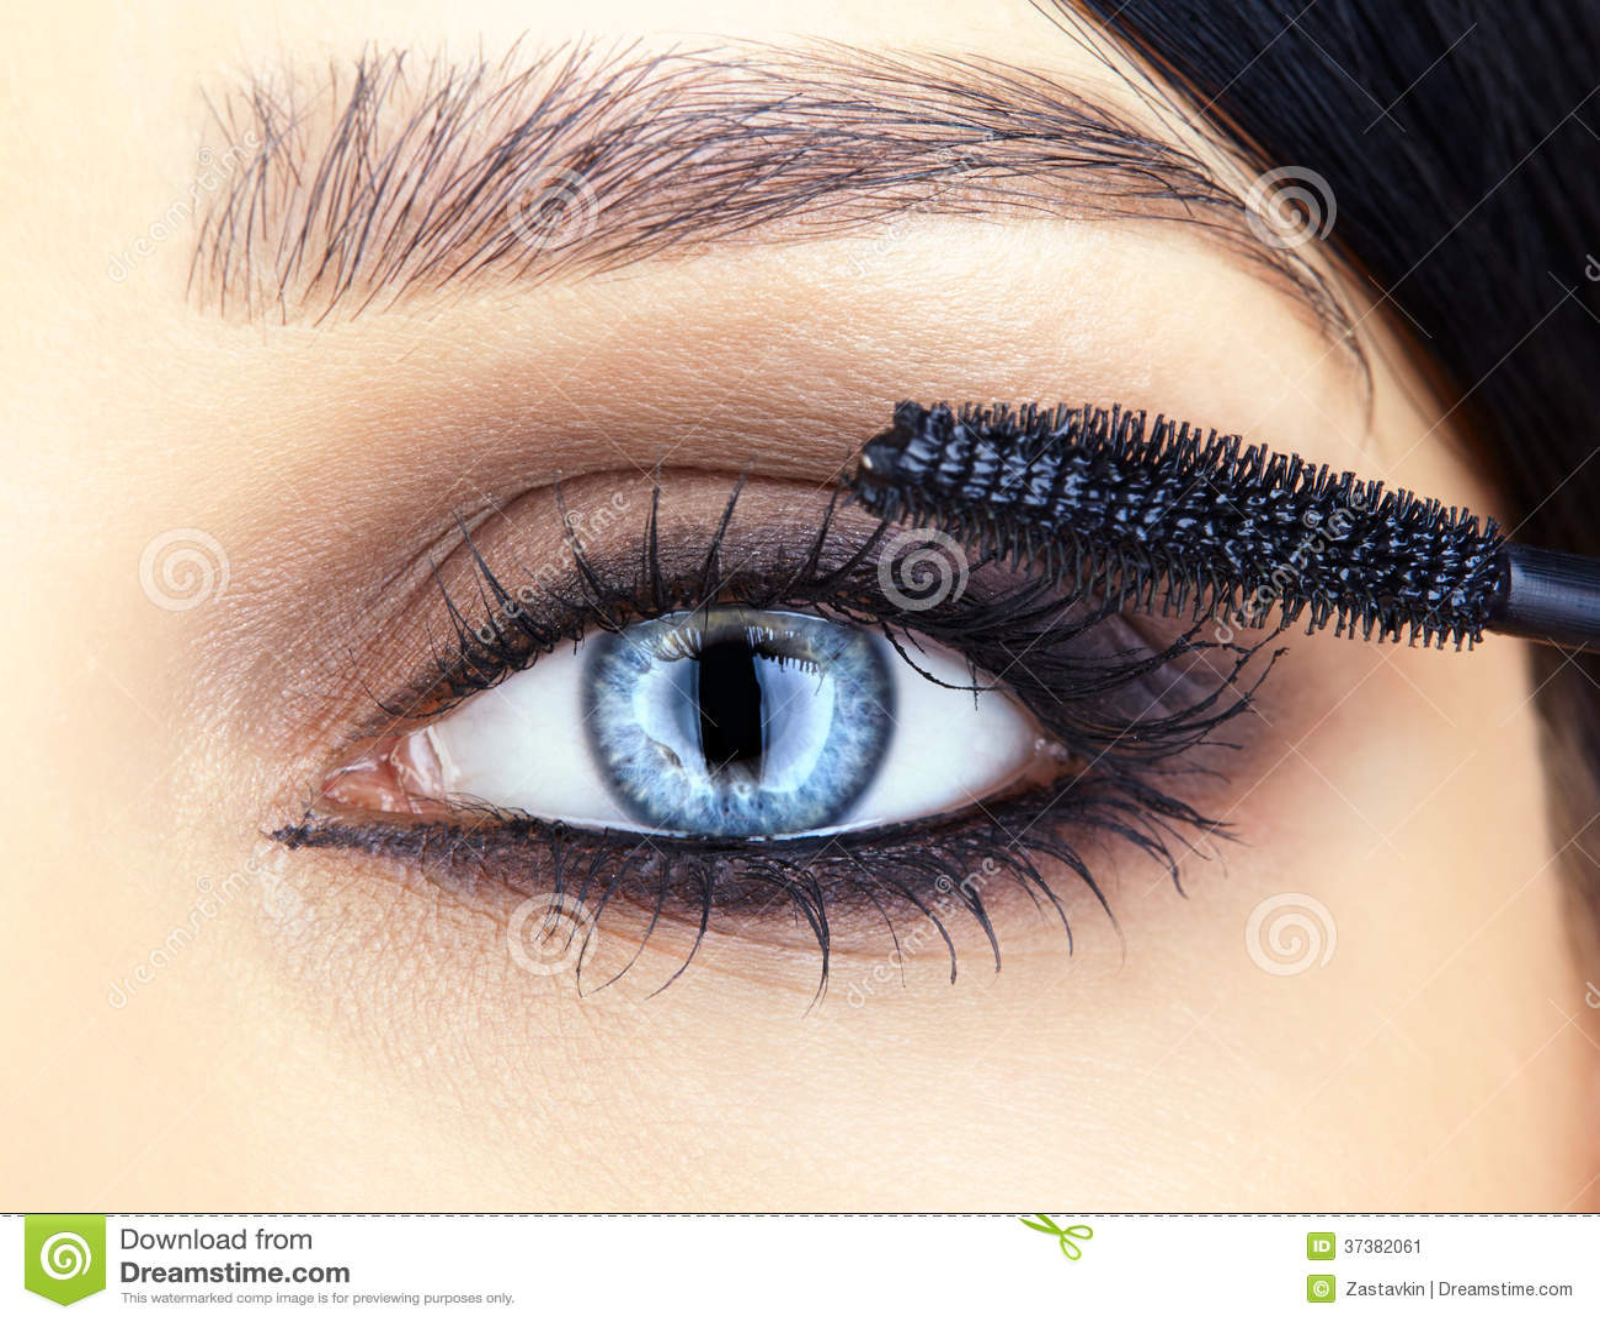 close up shot of woman eye makeup stock image image 37382061. Black Bedroom Furniture Sets. Home Design Ideas